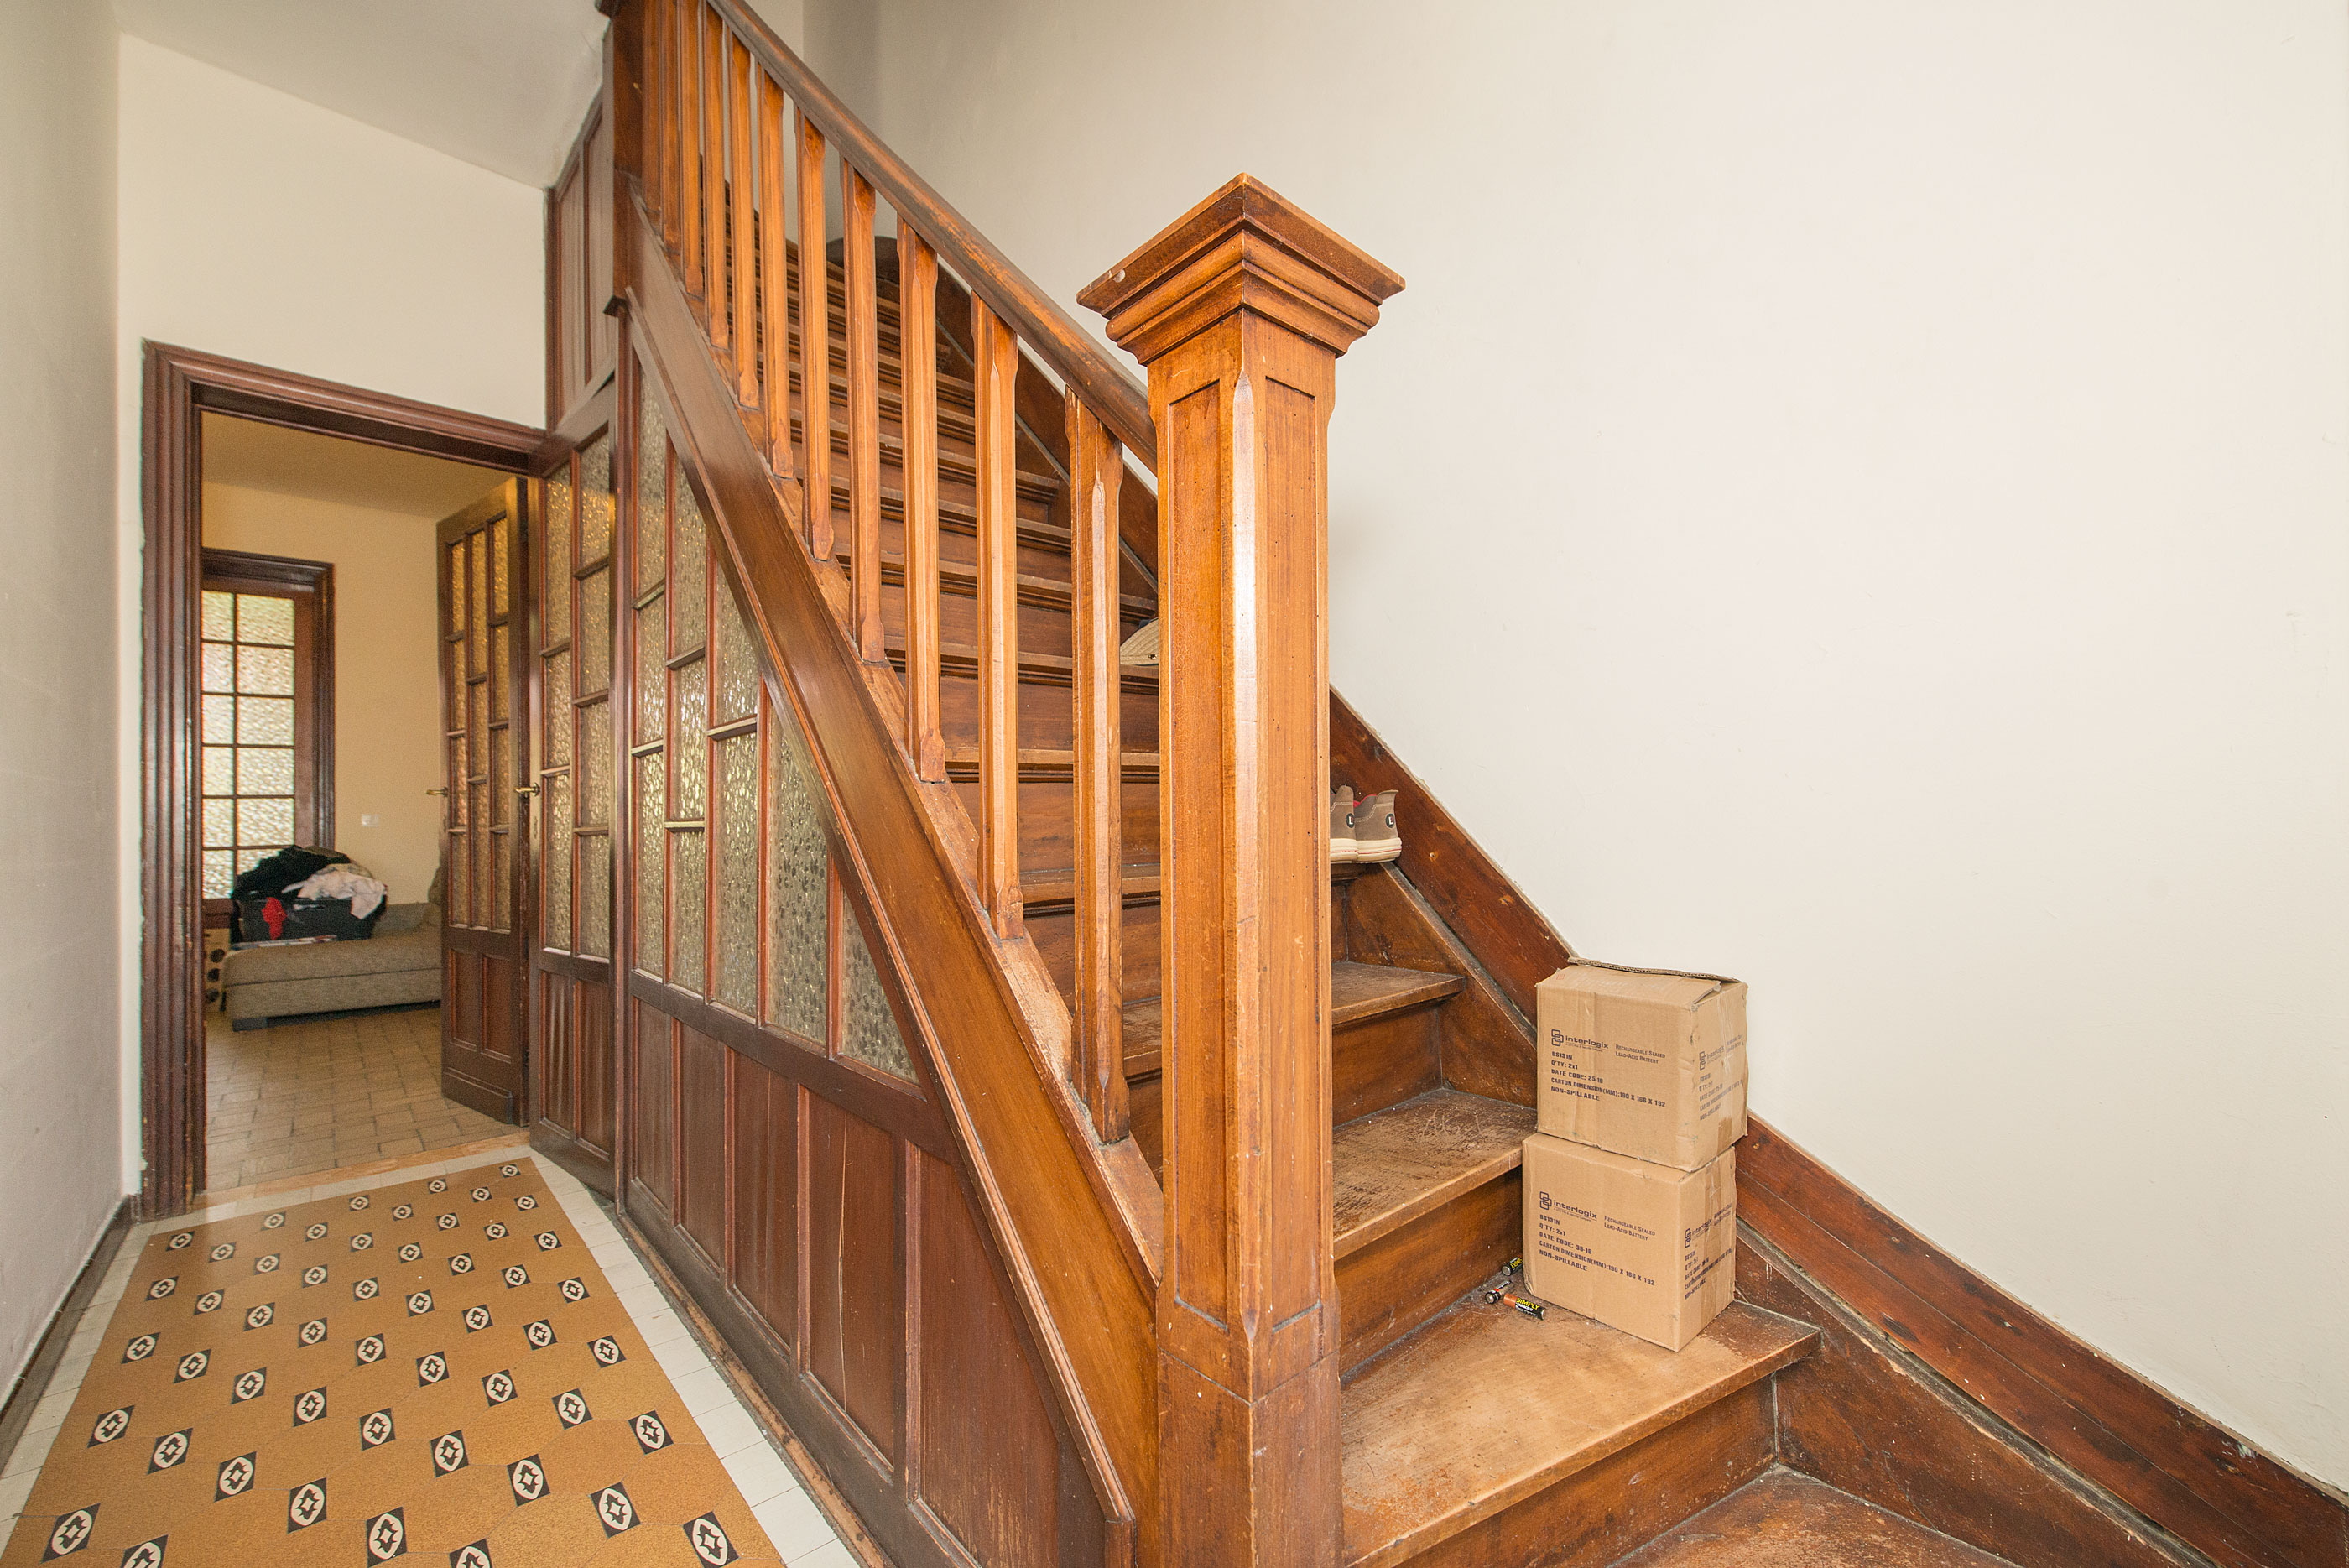 maison 2 fa ades halle a vendre nos offres immobili re berth. Black Bedroom Furniture Sets. Home Design Ideas